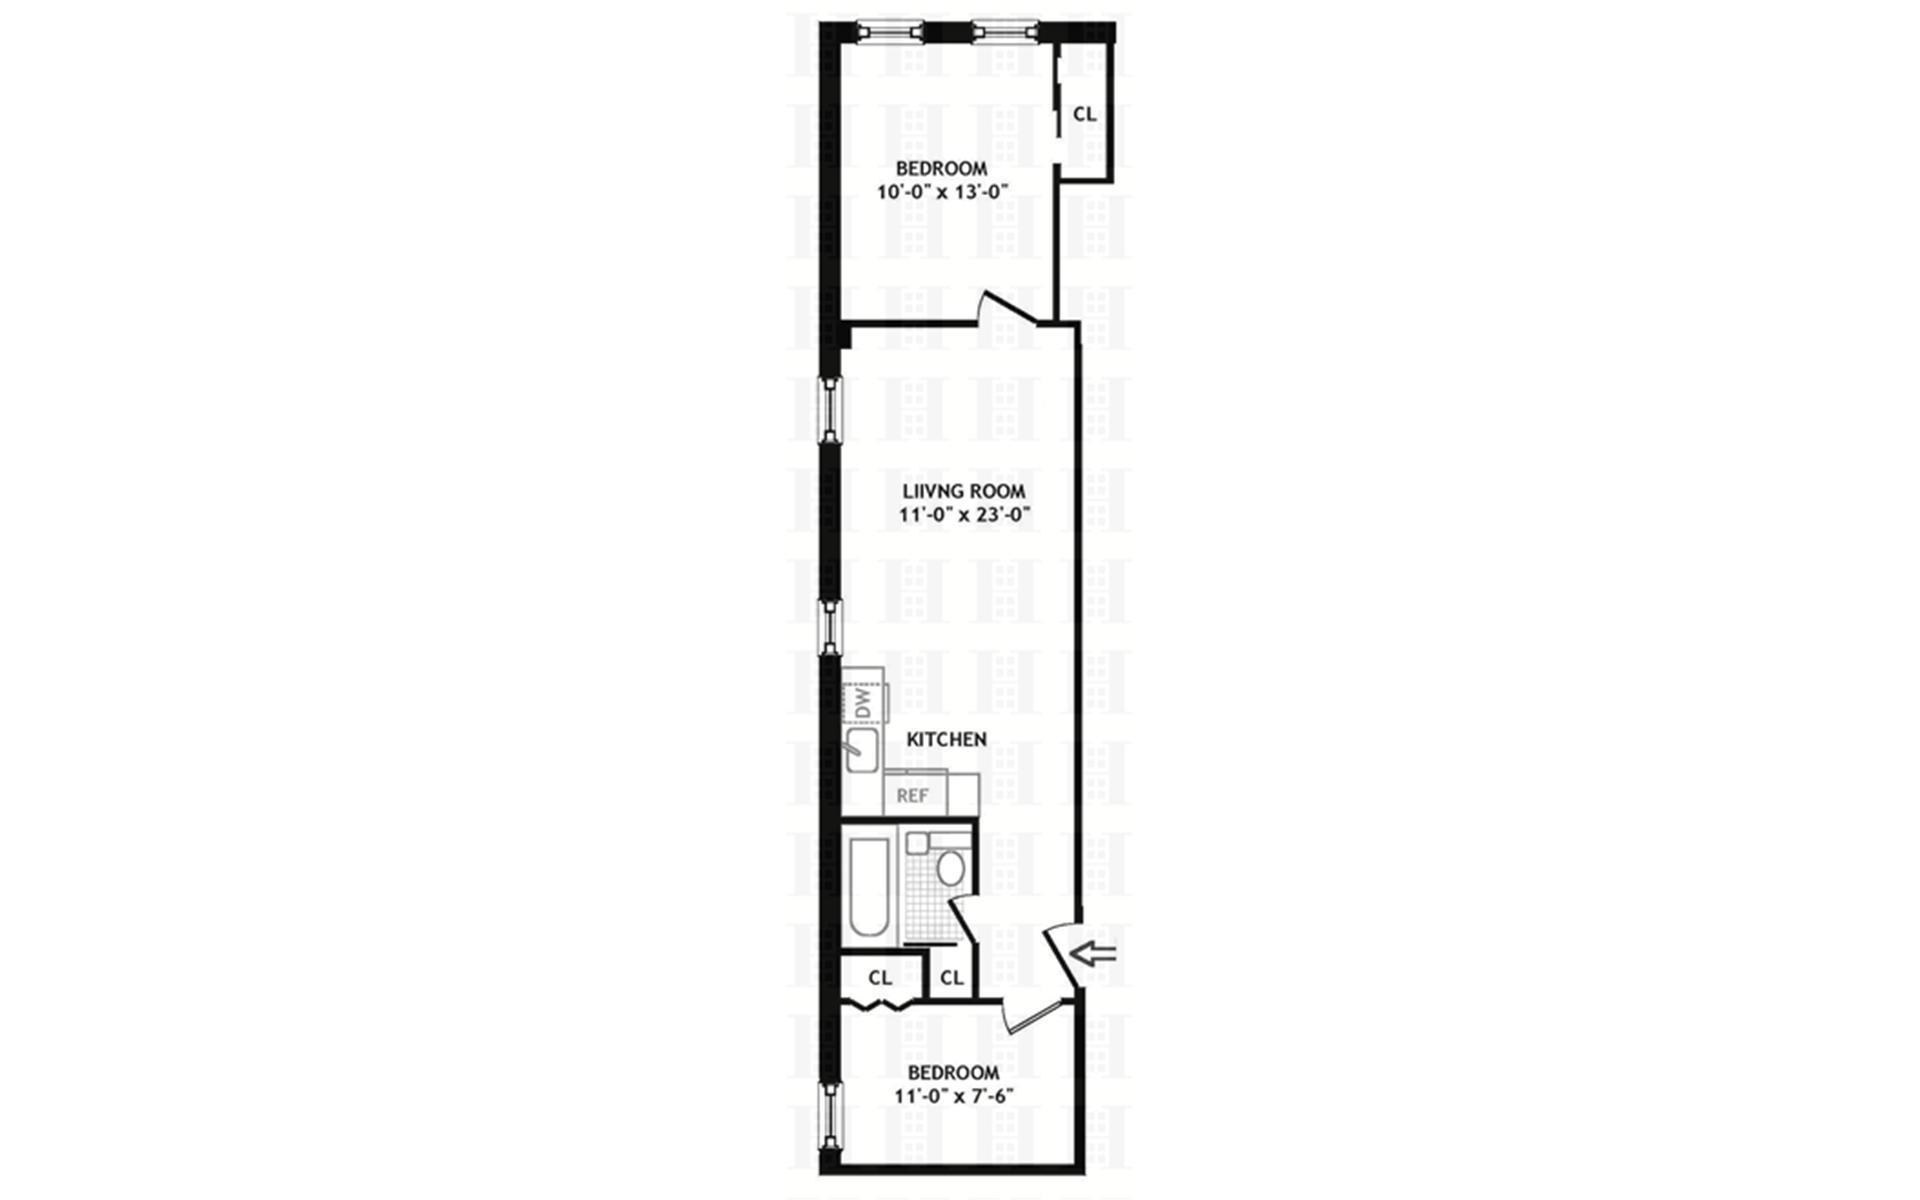 Floor plan of 203 West 87th St, 42 - Upper West Side, New York